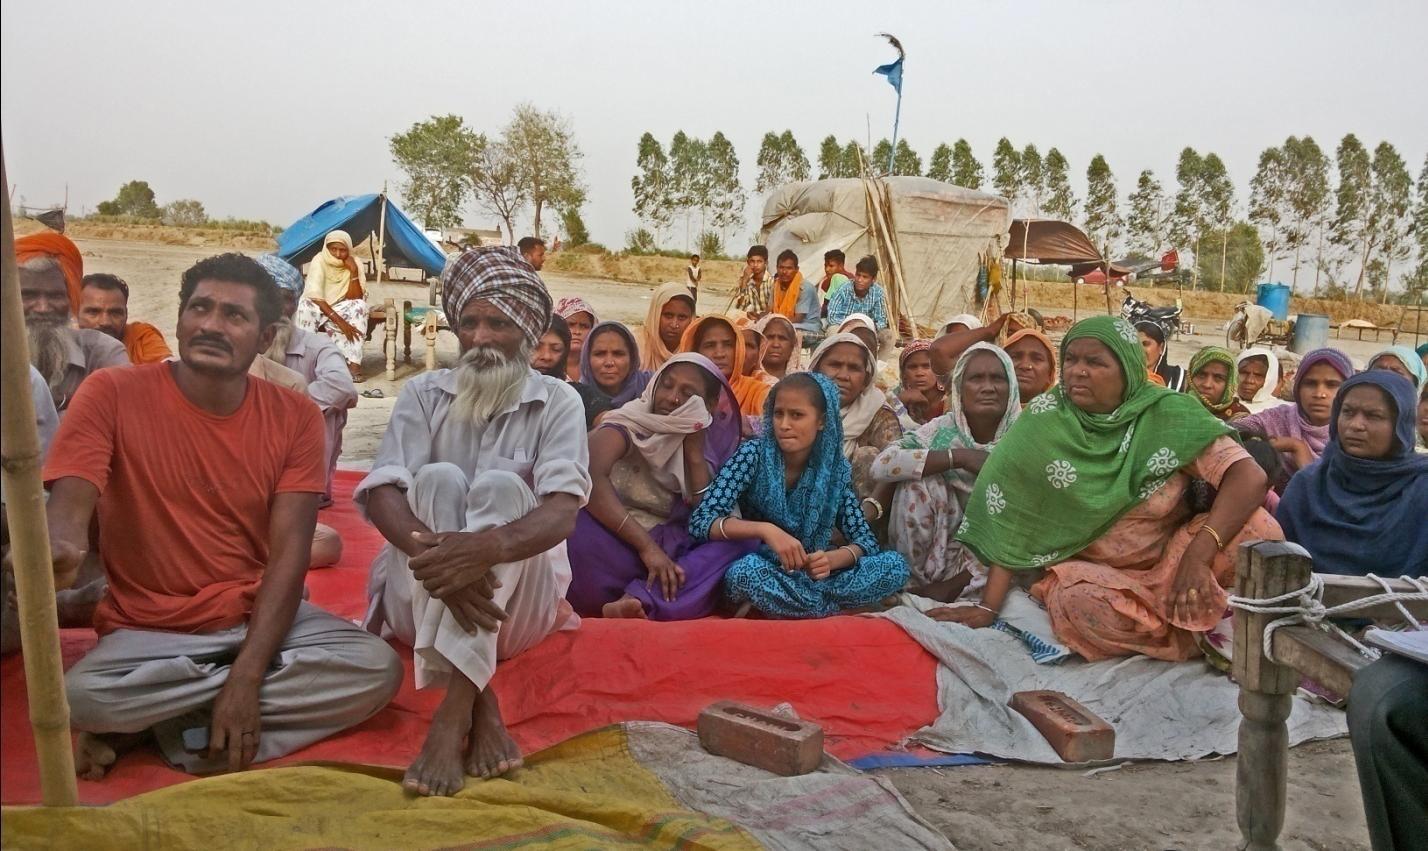 Group of men and women sitting in front of makeshift Gurudwara